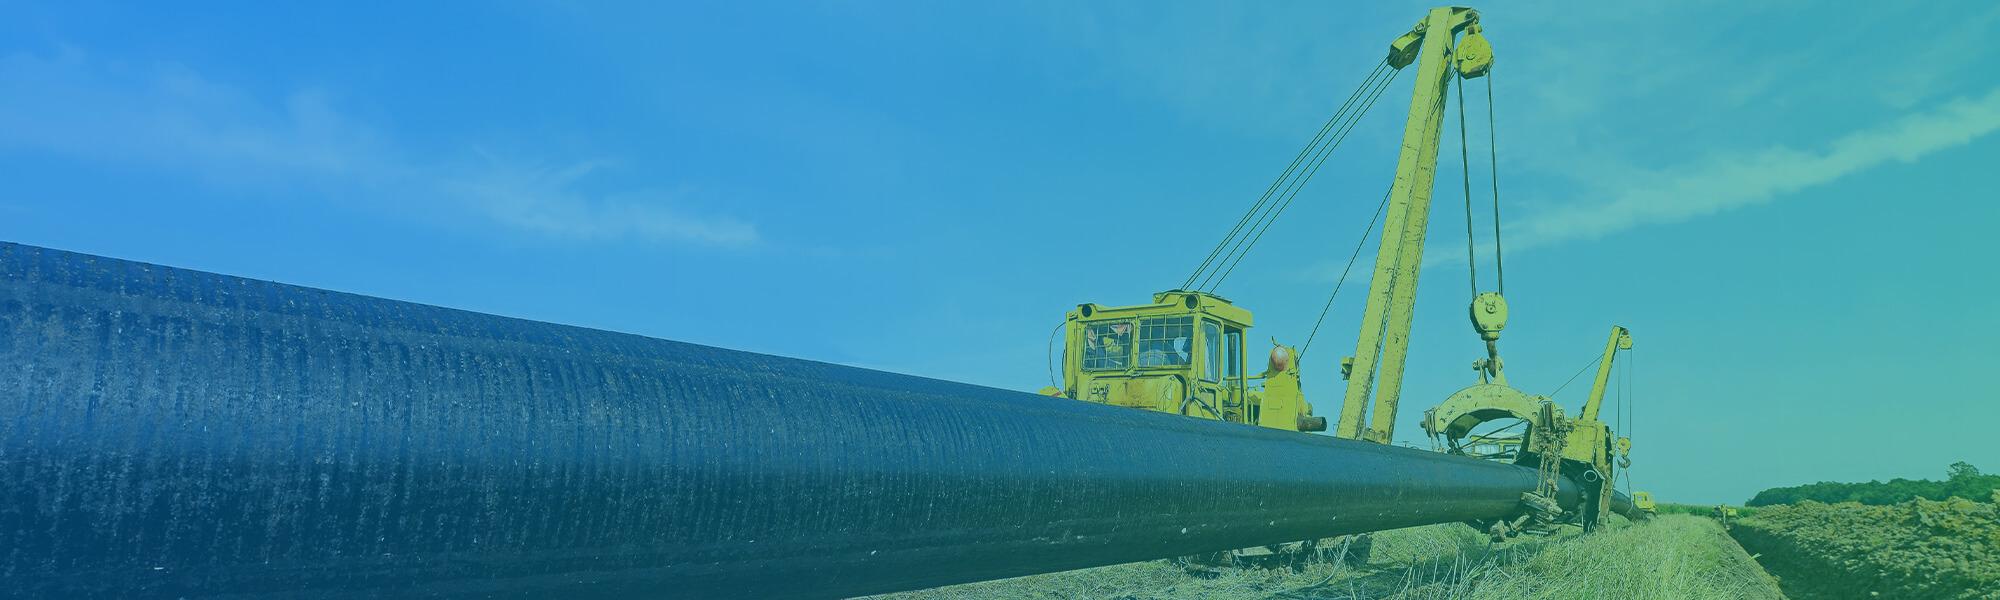 cosymap-branche-gasnetzbetreiber